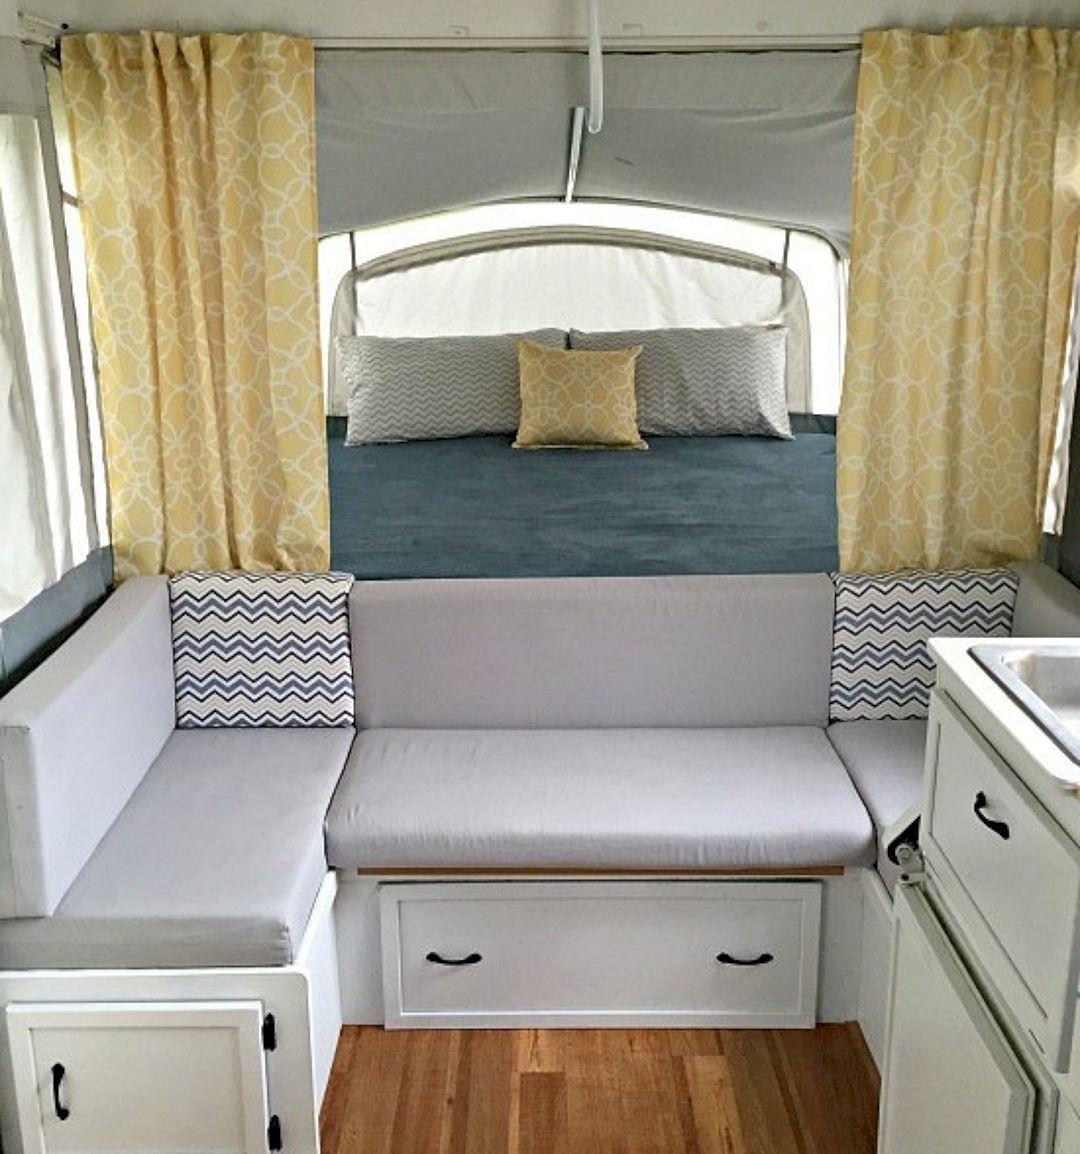 Top 15 Diy Camper Interior Remodel Ideas You Can Try Right Now Camper Interior Design Camper Decor Glamper Camper